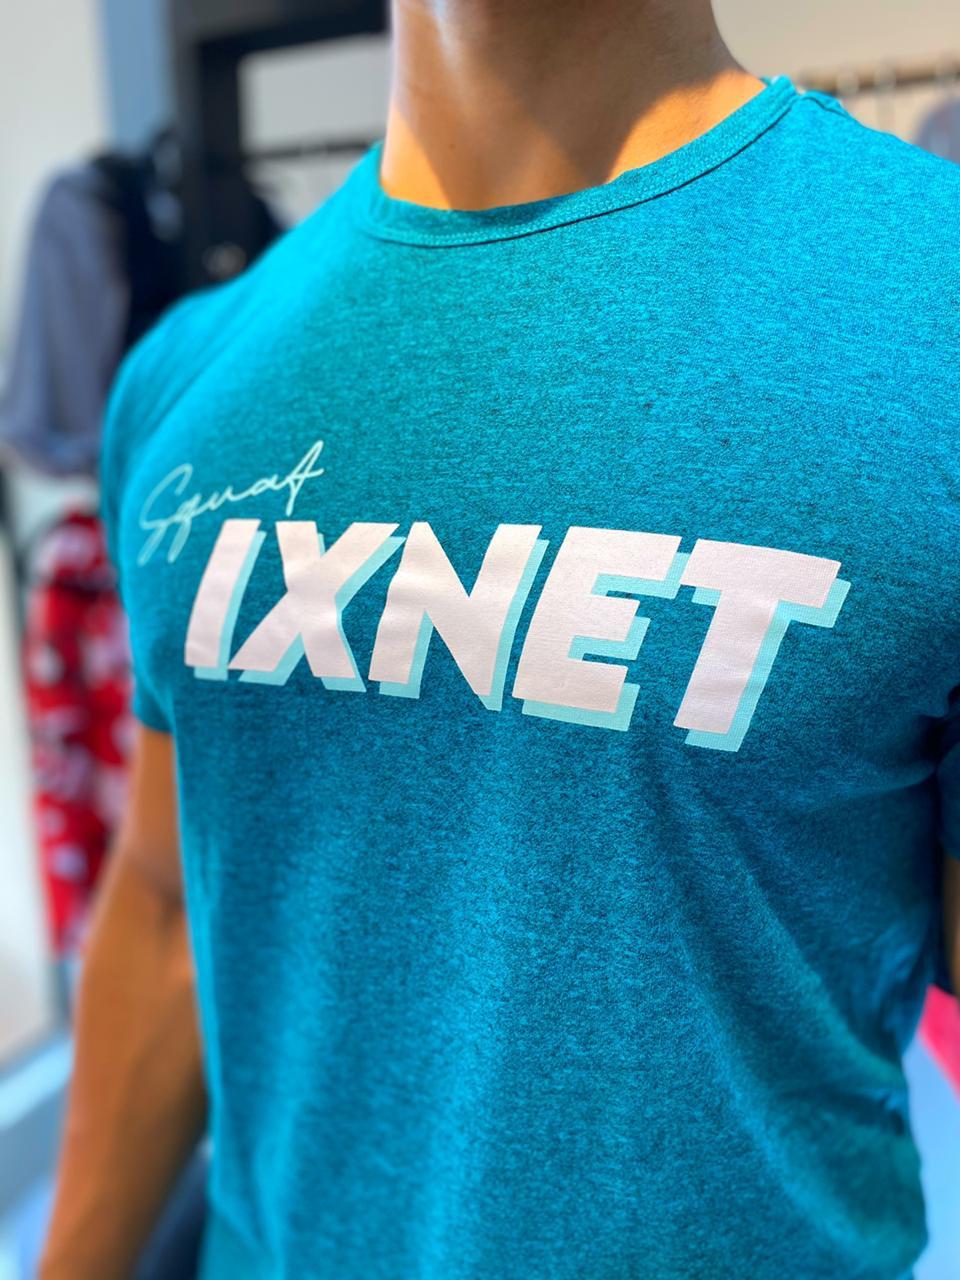 Camiseta JerkBox IxNet